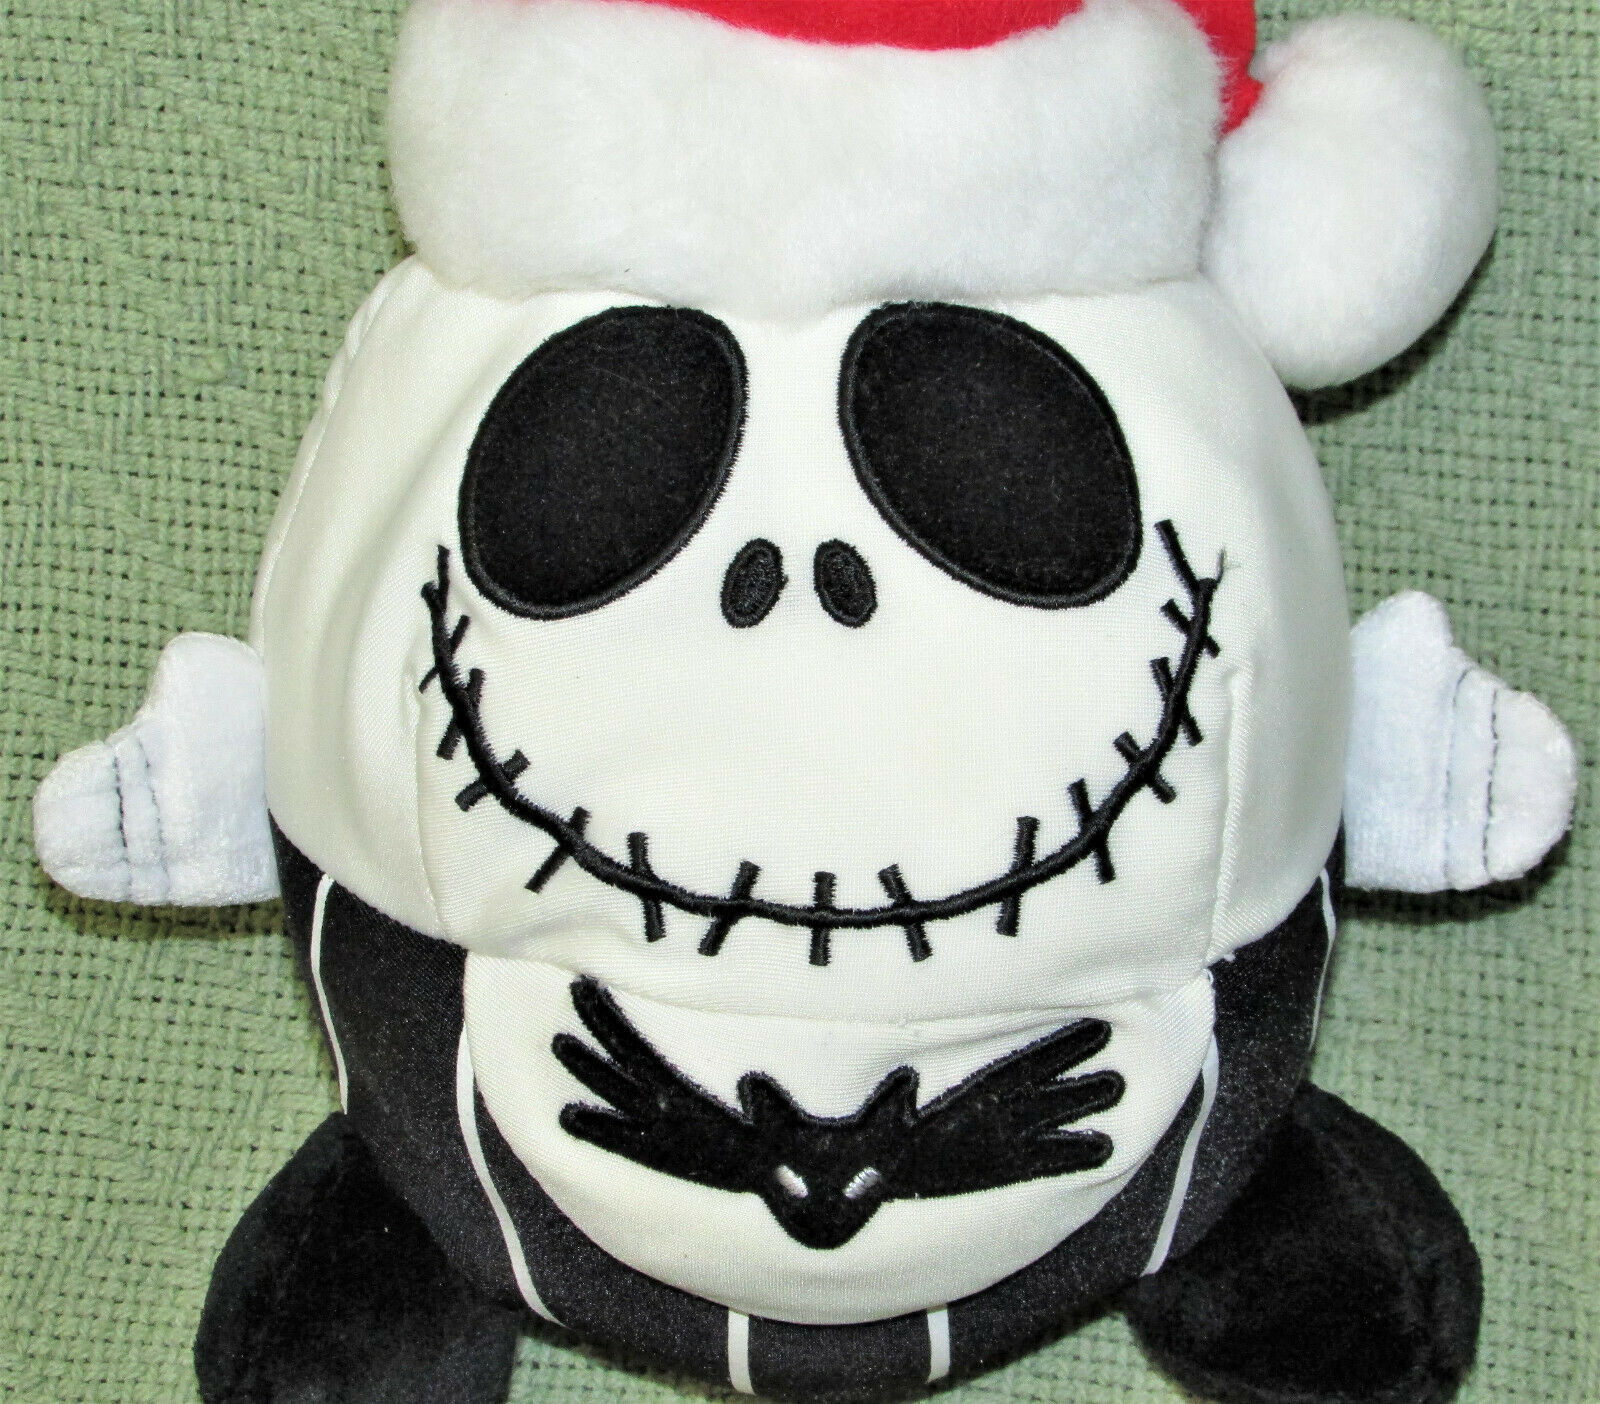 "DISNEY JACK SKELLINGTON SANTA PLUSH NIGHTMARE BEFORE CHRISTMAS 8"" ROUND PLUSH image 2"